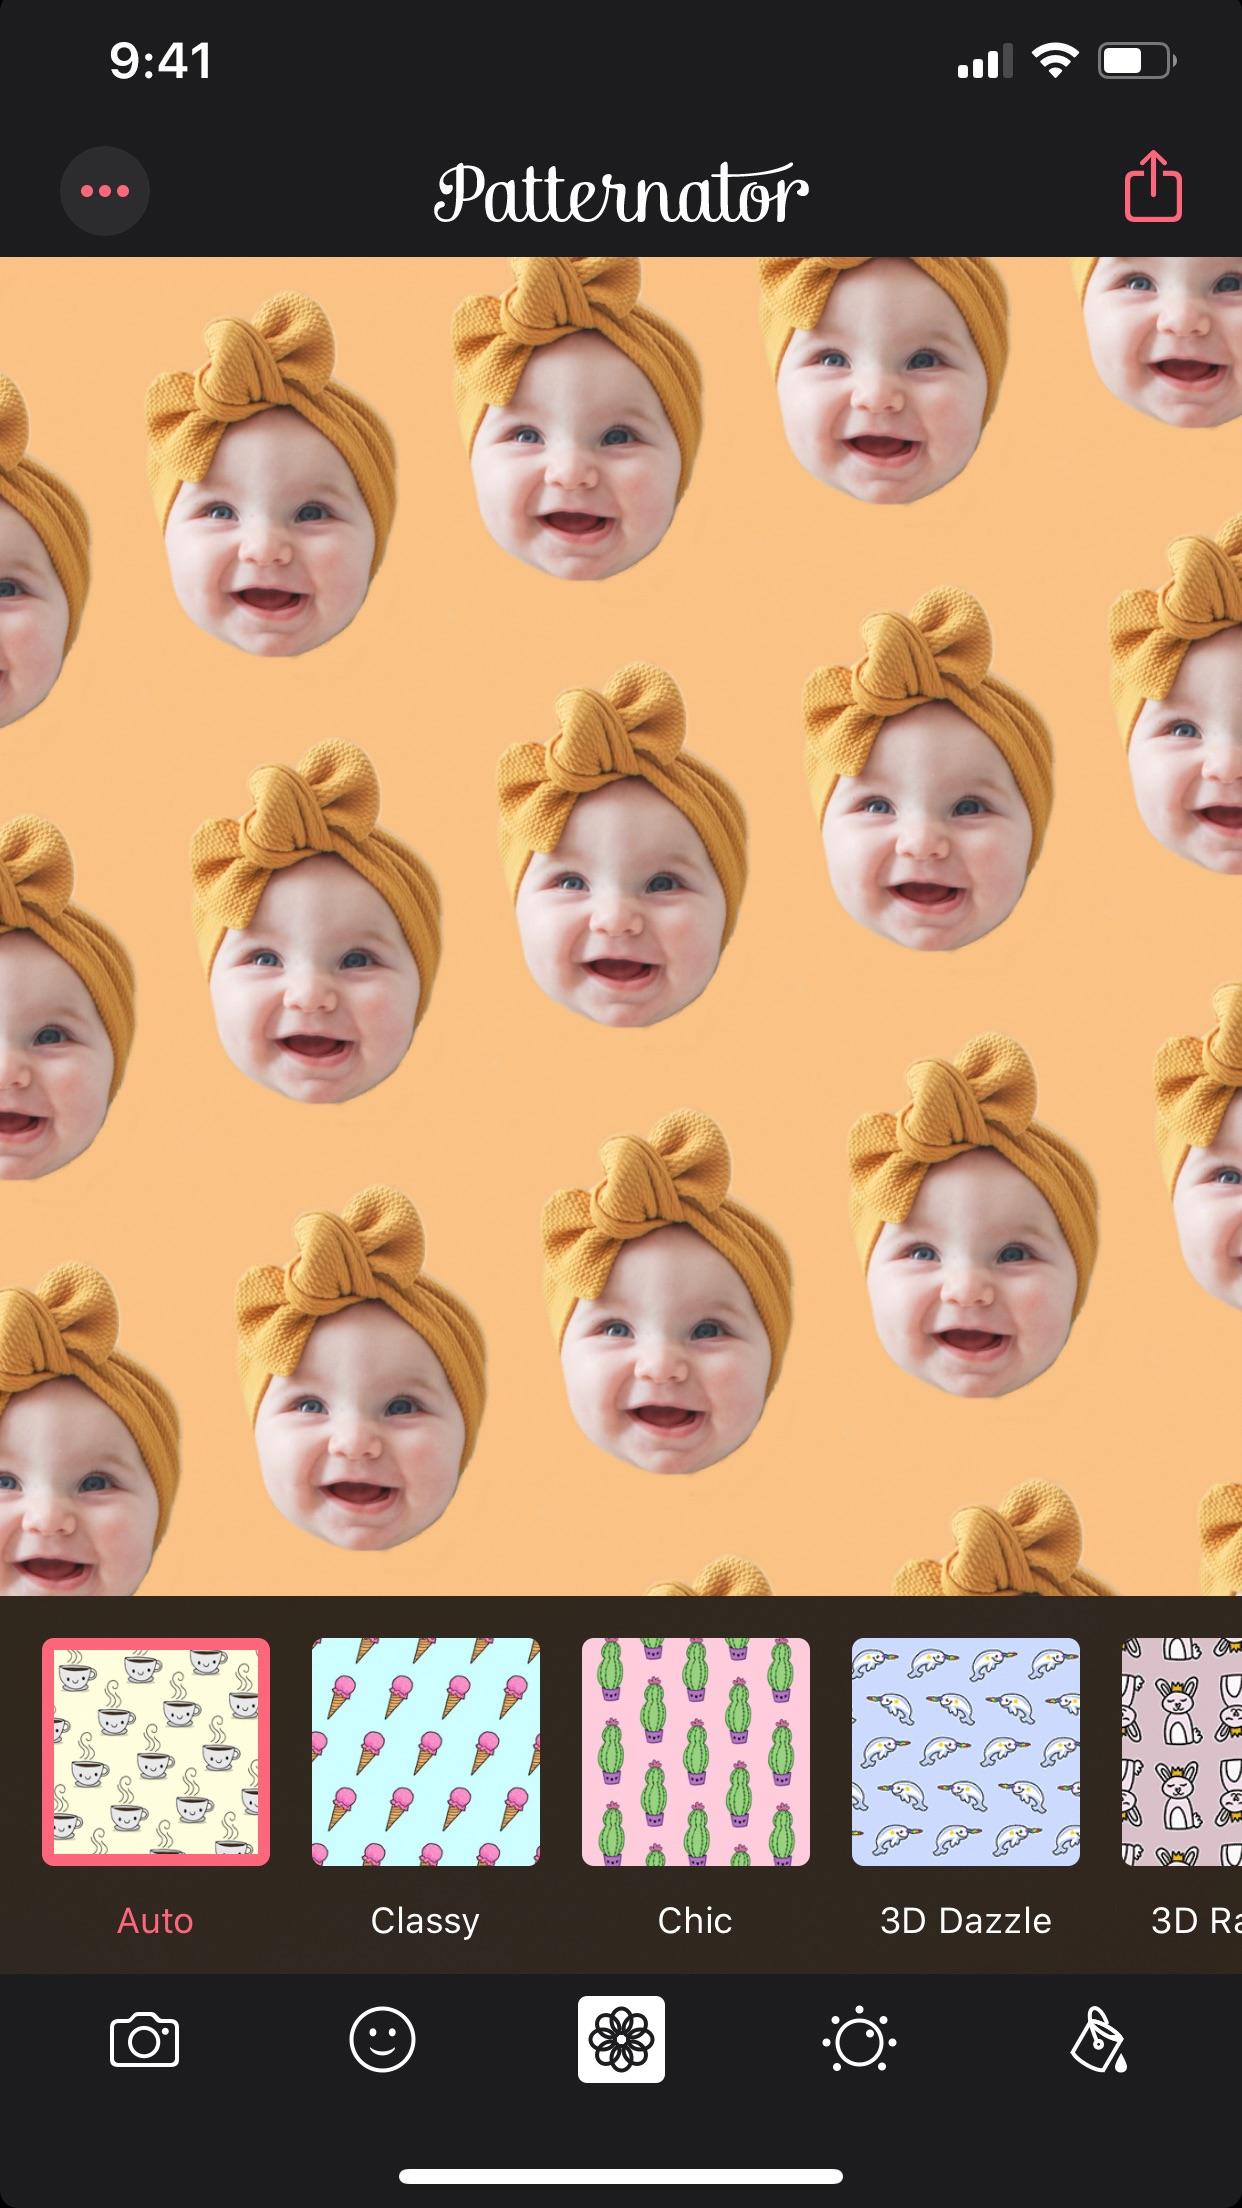 Patternator Video Wallpapers Screenshot